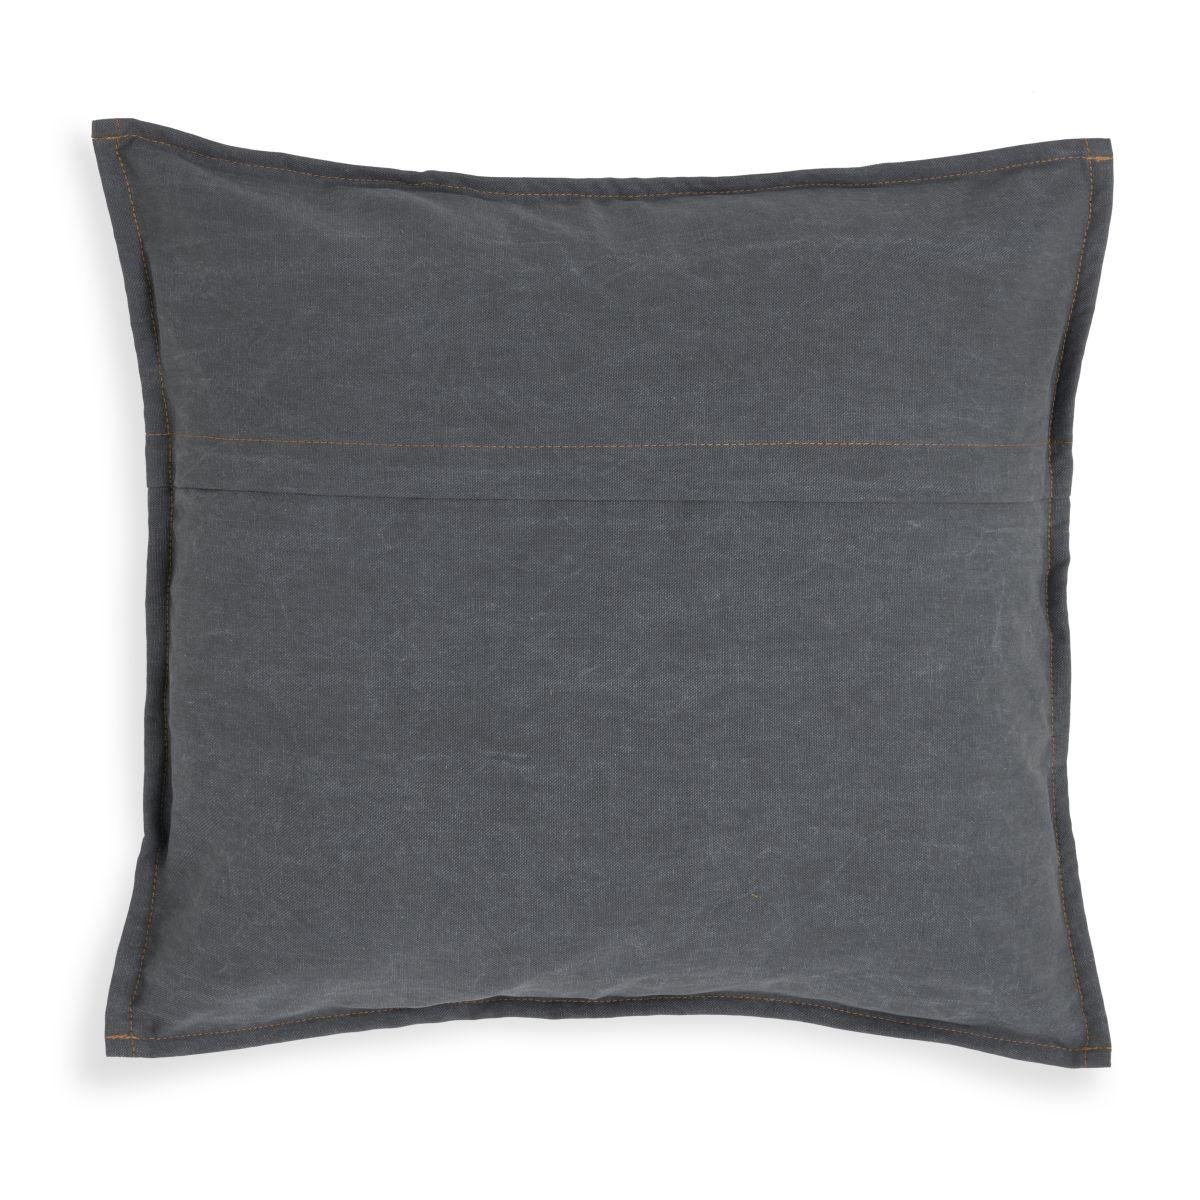 knit factory kf154012010 hope kussen antraciet 50x50 2